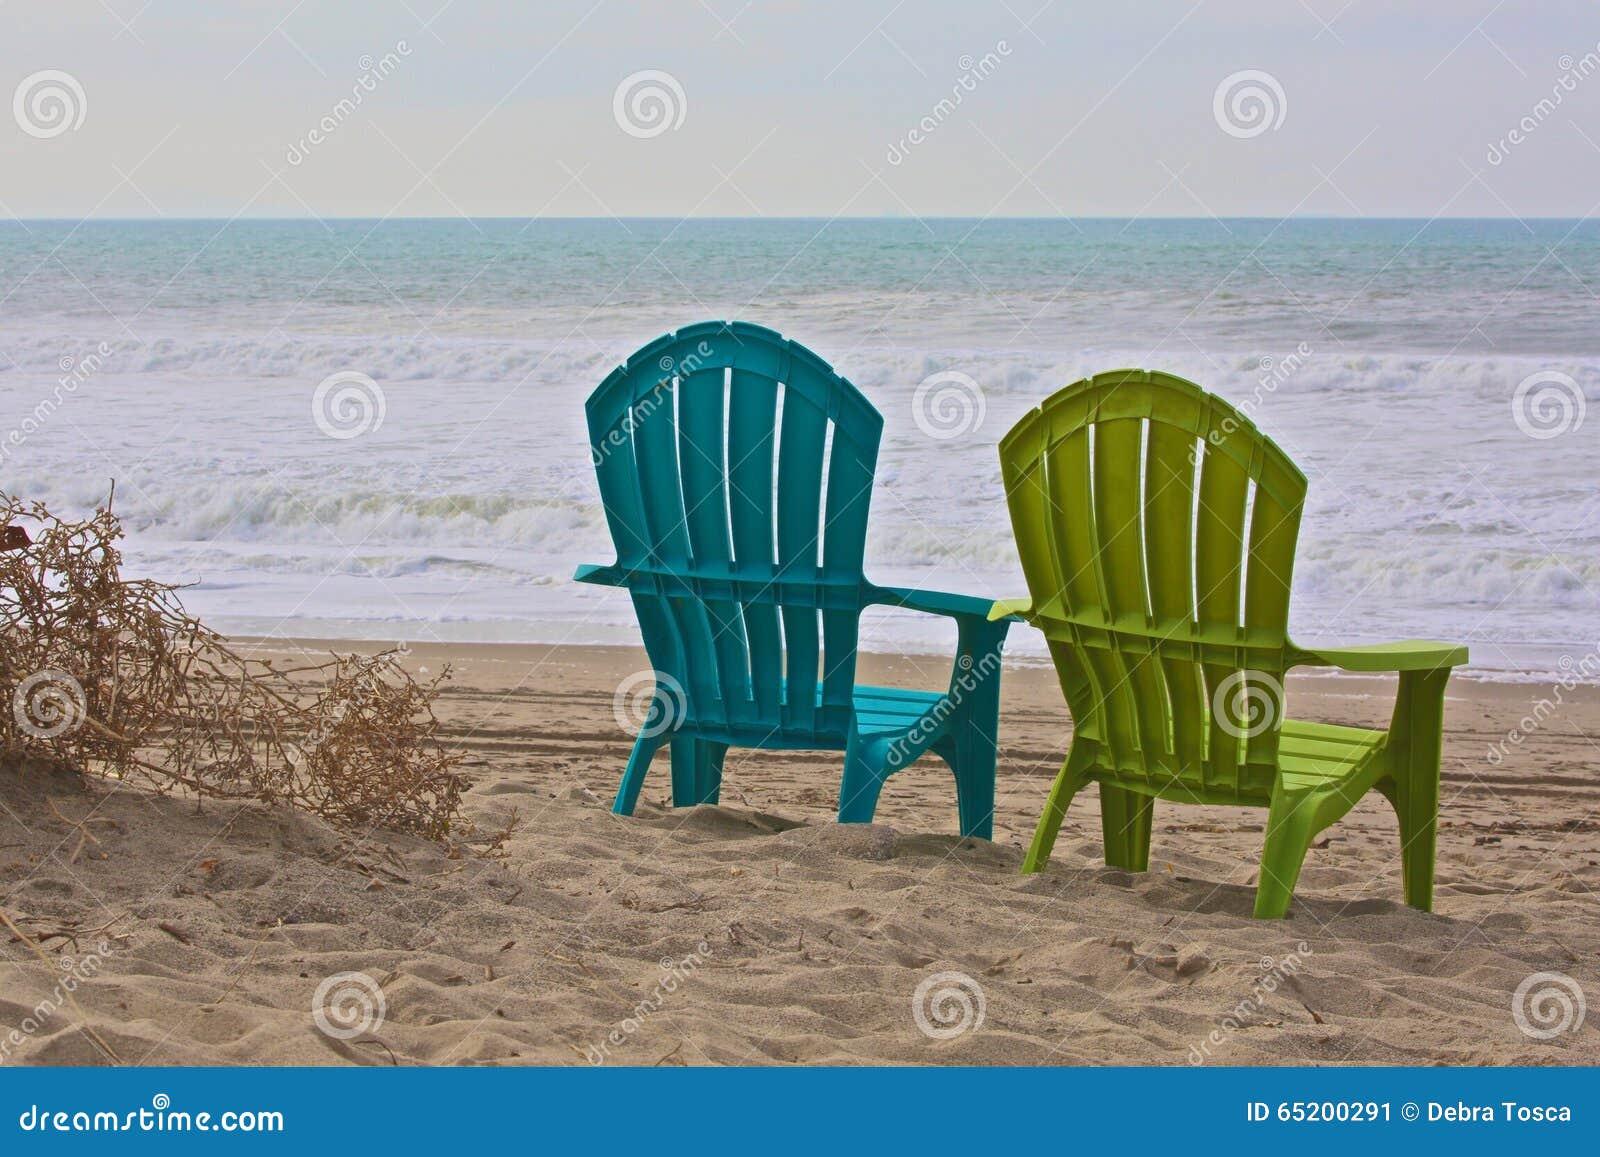 Adirondack chairs ocean stock image. Image of ocean, chairs ...